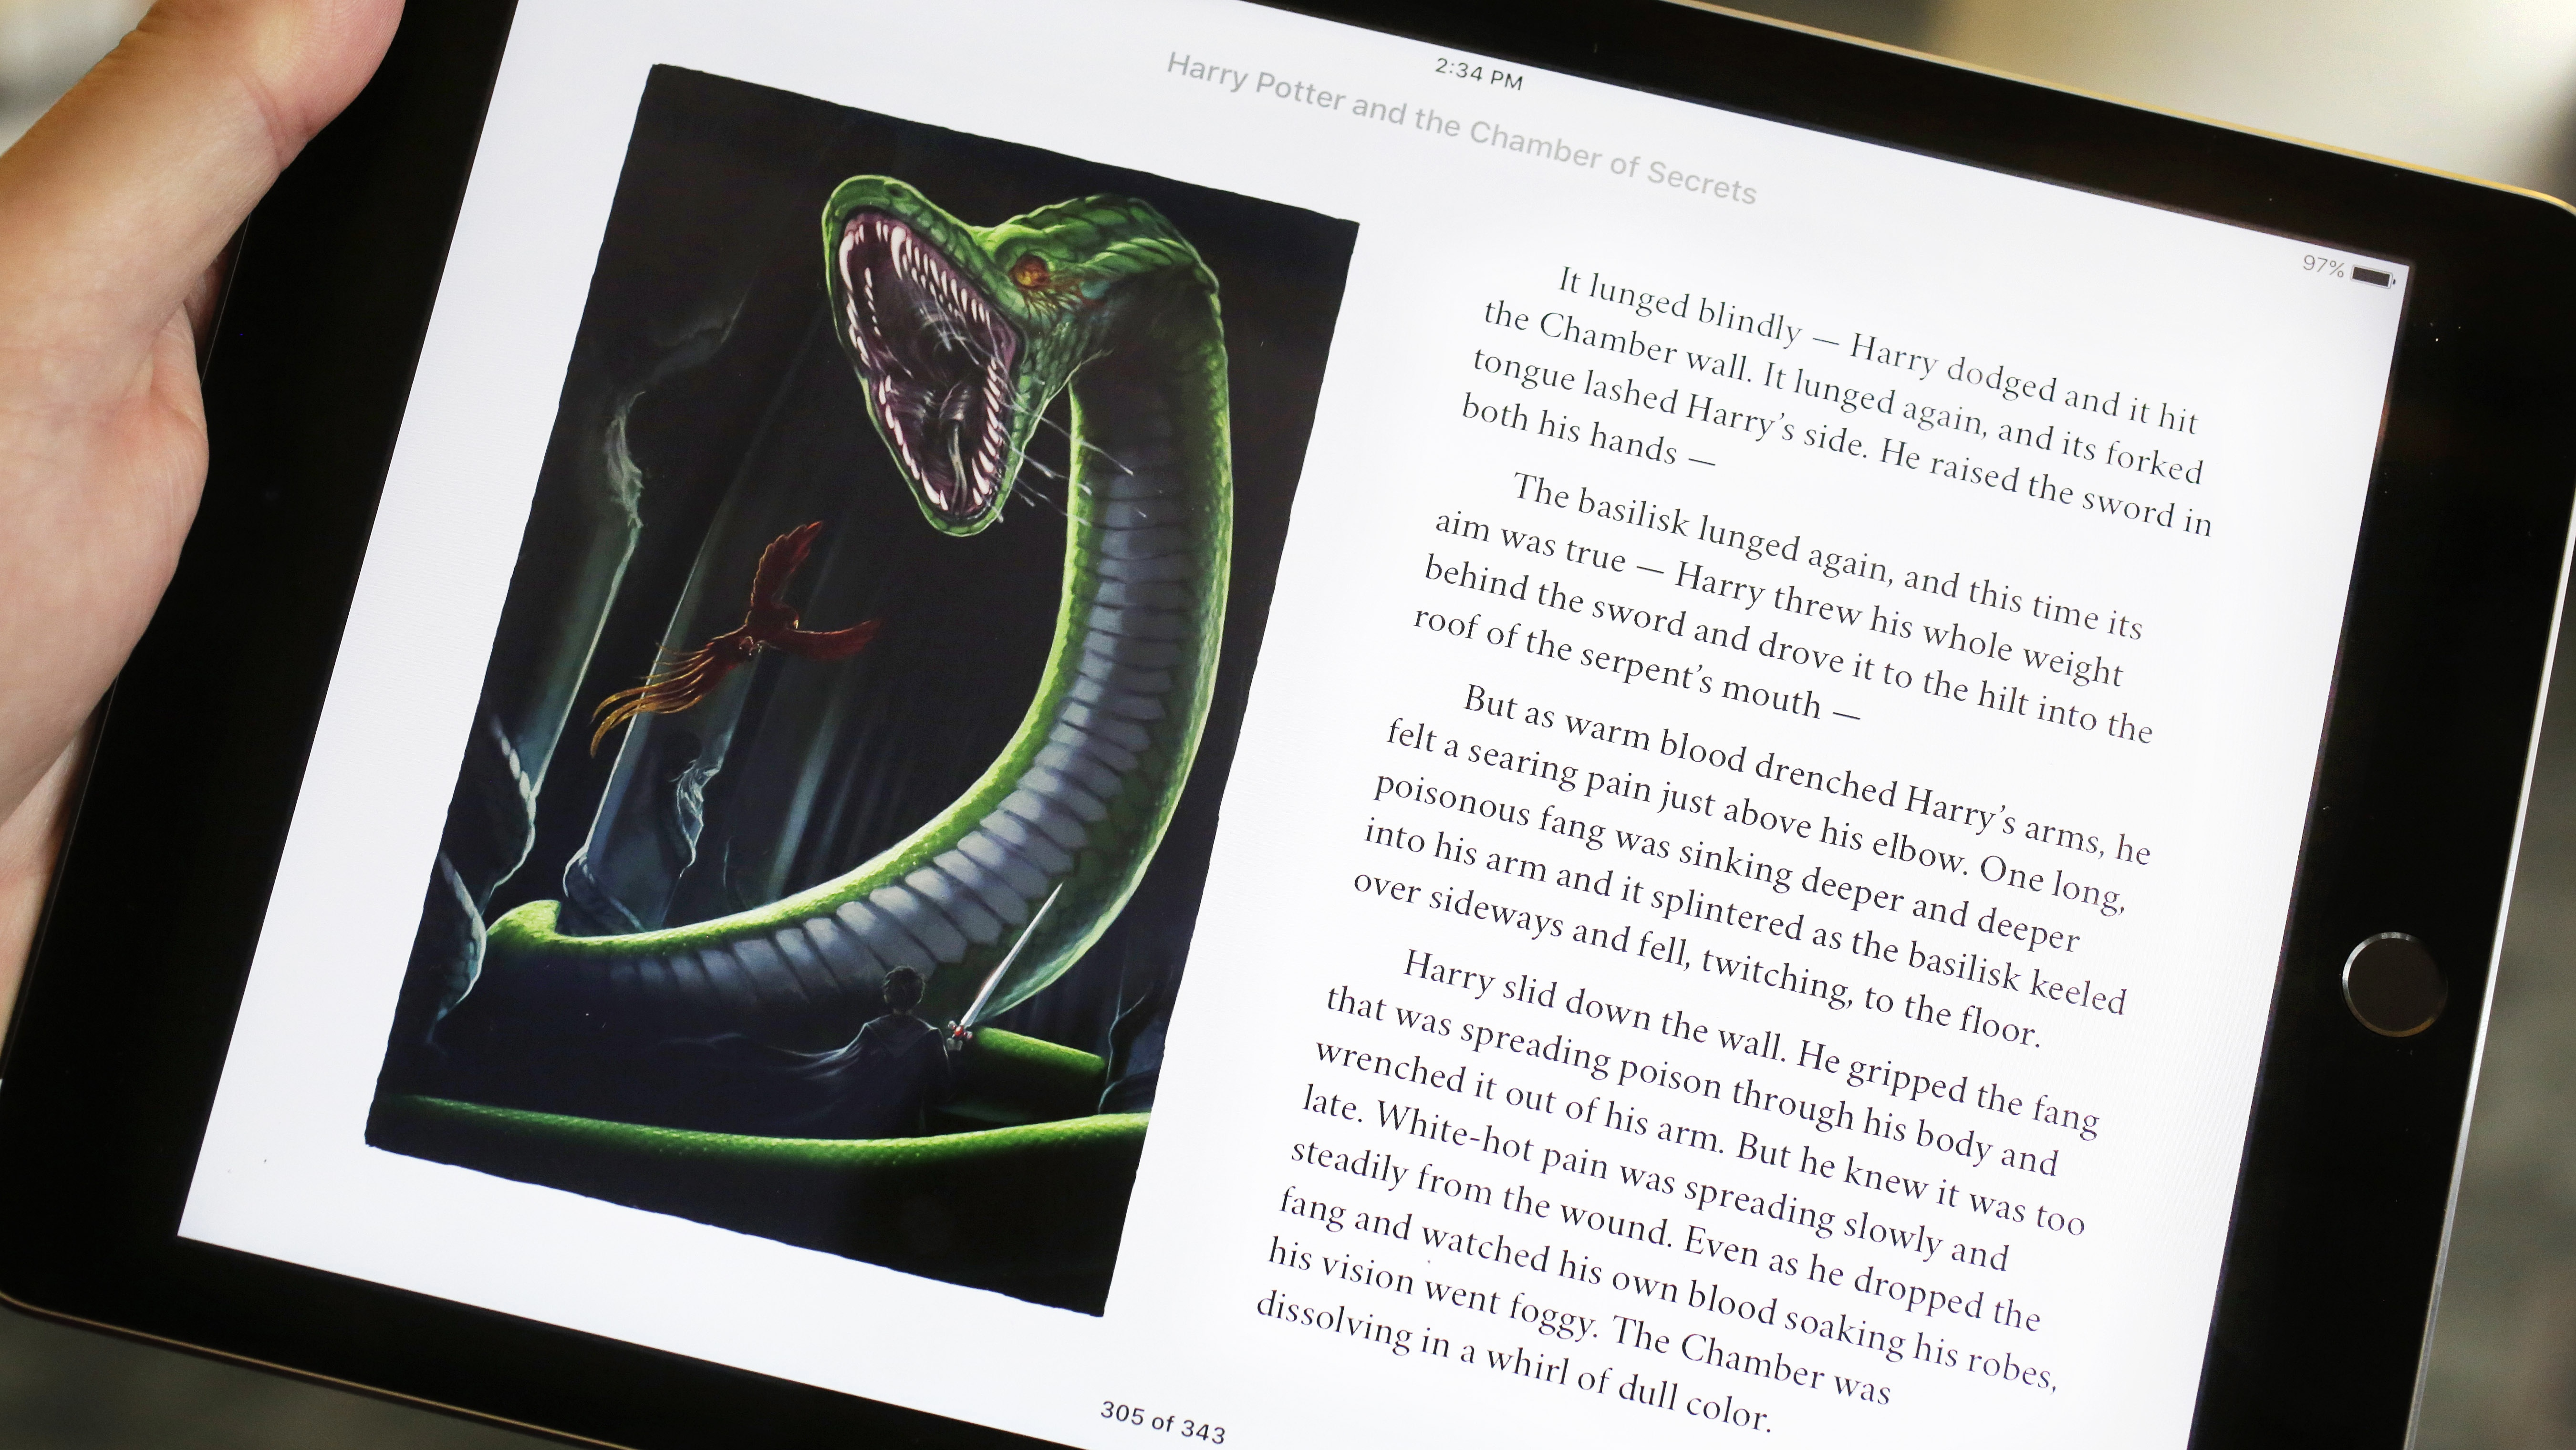 Enhanced Apple 'Harry Potter' E-Book - H 2015